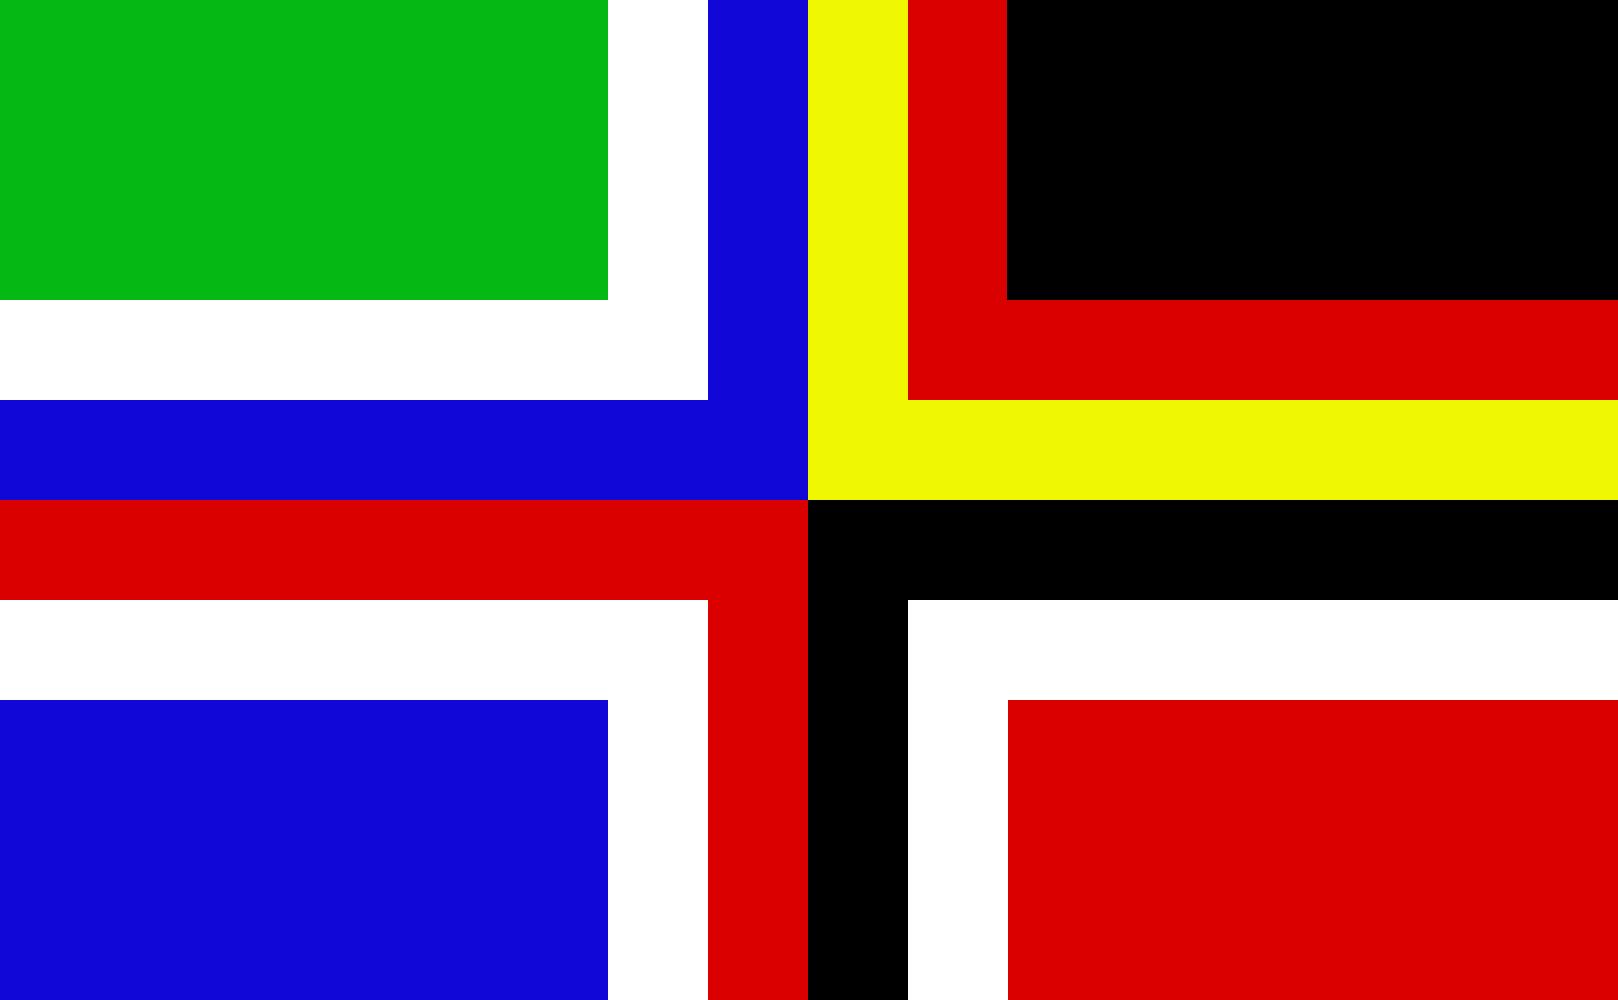 alternate flag of germany by spiritswriter123 on deviantart